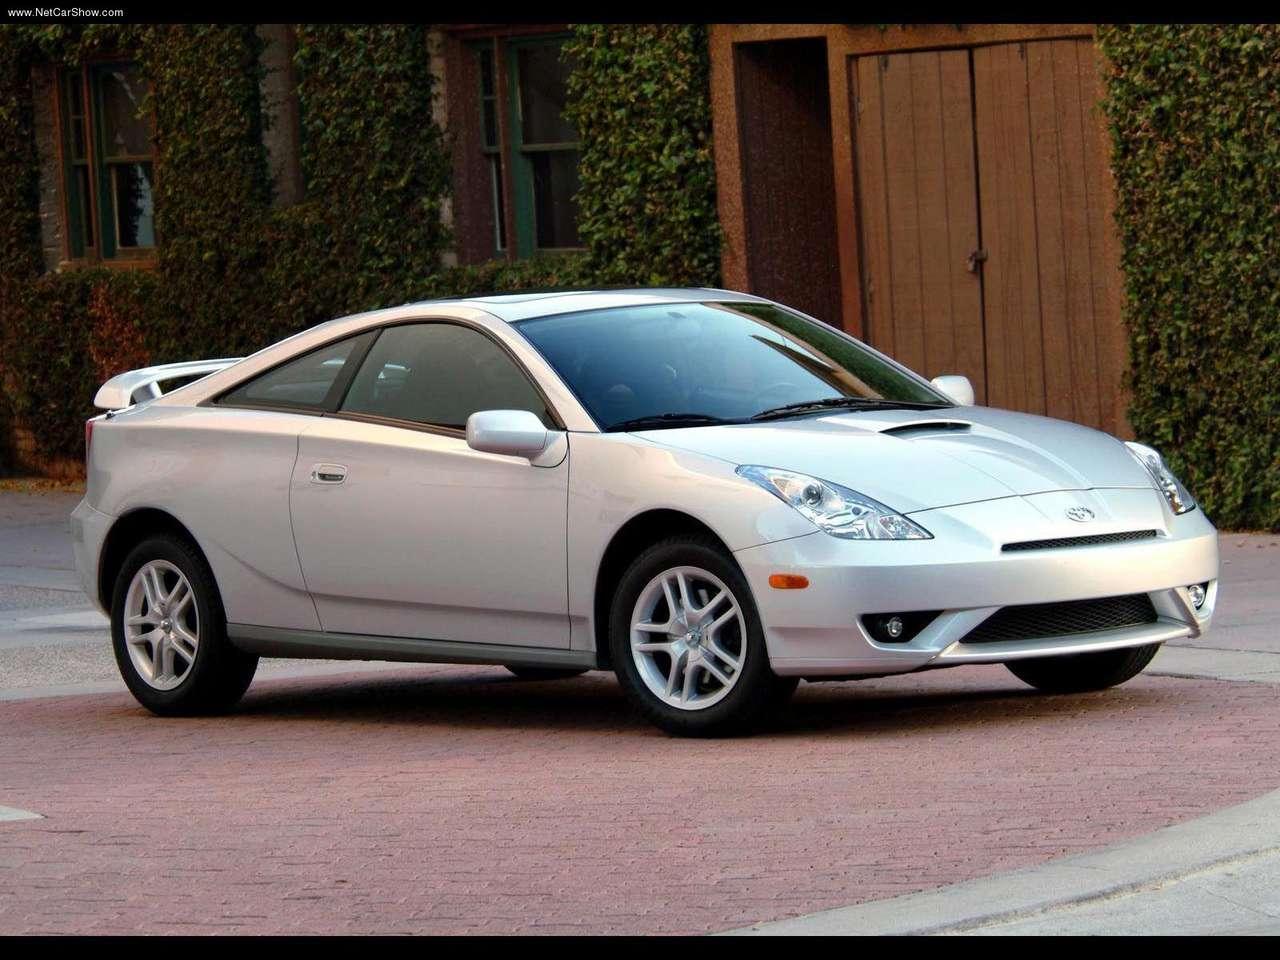 http://1.bp.blogspot.com/_xhqjRo6NERQ/S8mwif5o3xI/AAAAAAAAIOY/7Qga0M2CV-0/s1600/Toyota-Celica_GTS_2003_1280x960_wallpaper_02.jpg